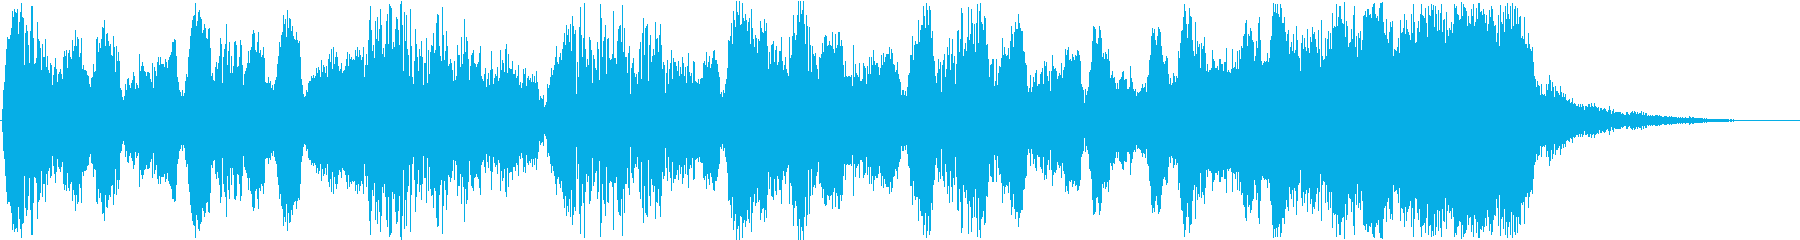 Flute-based jingle's reproduced waveform